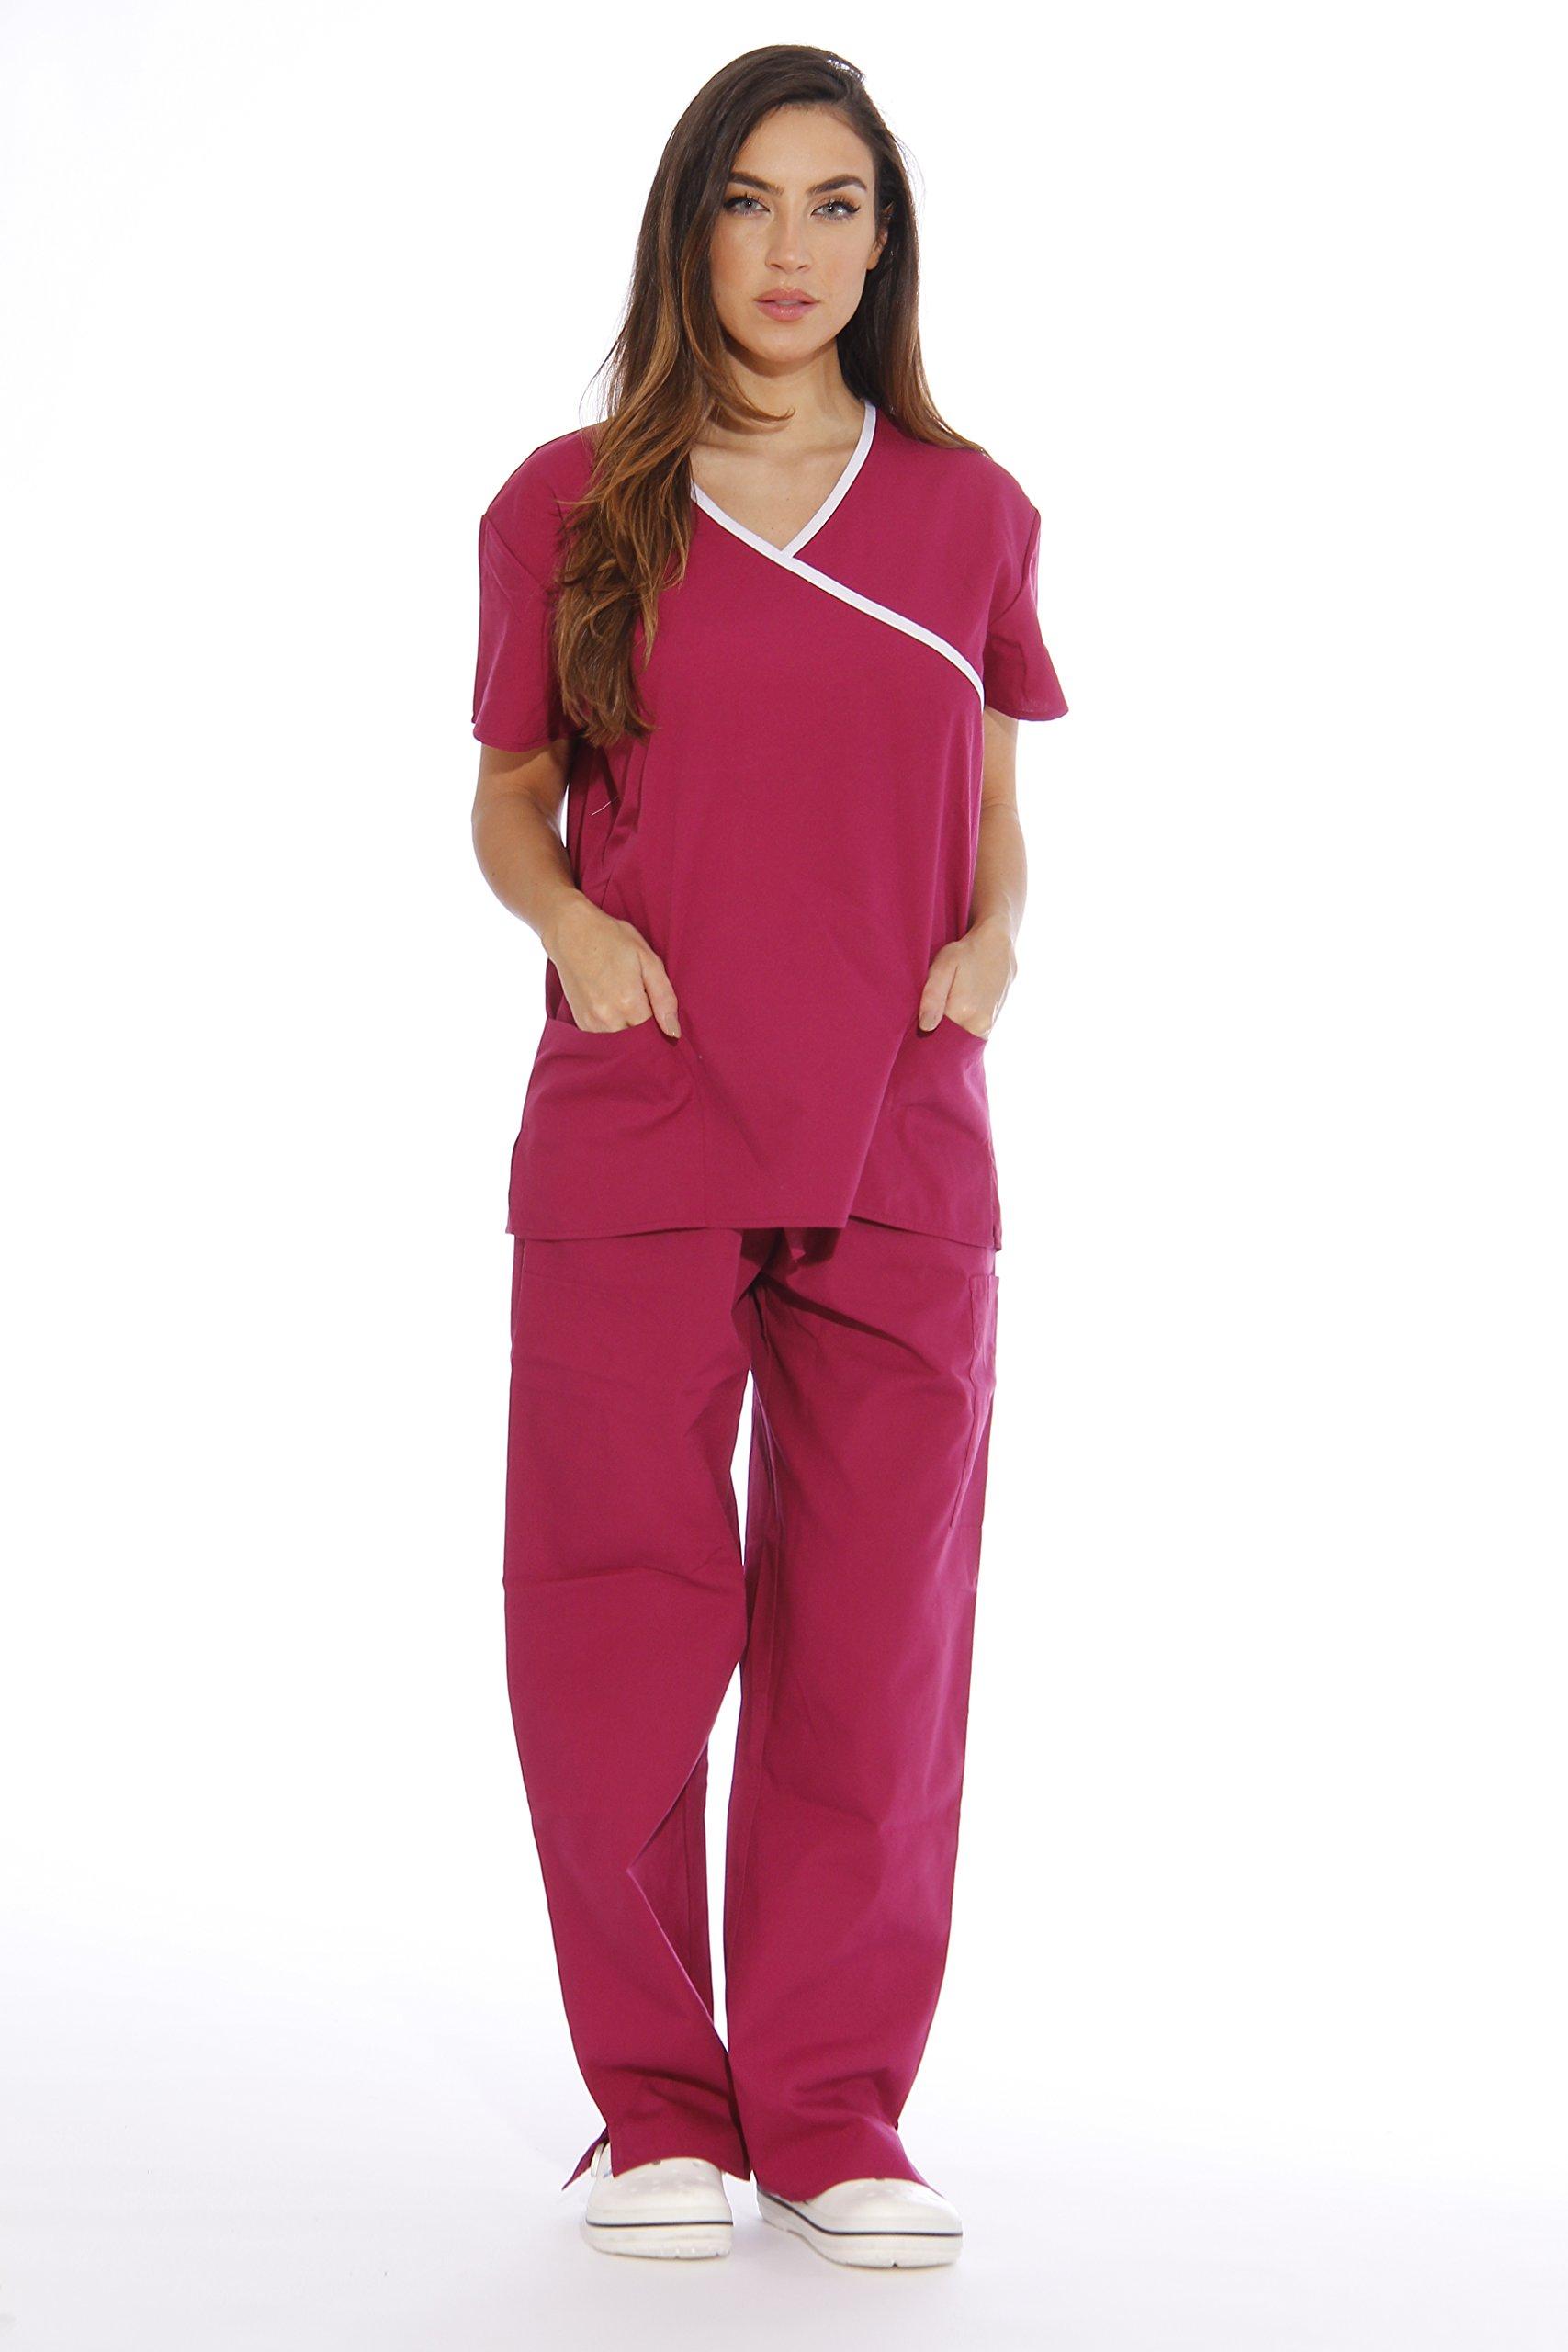 Just Love Women's Scrub Sets Medical Scrubs (Mock Wrap) 11151W-2X